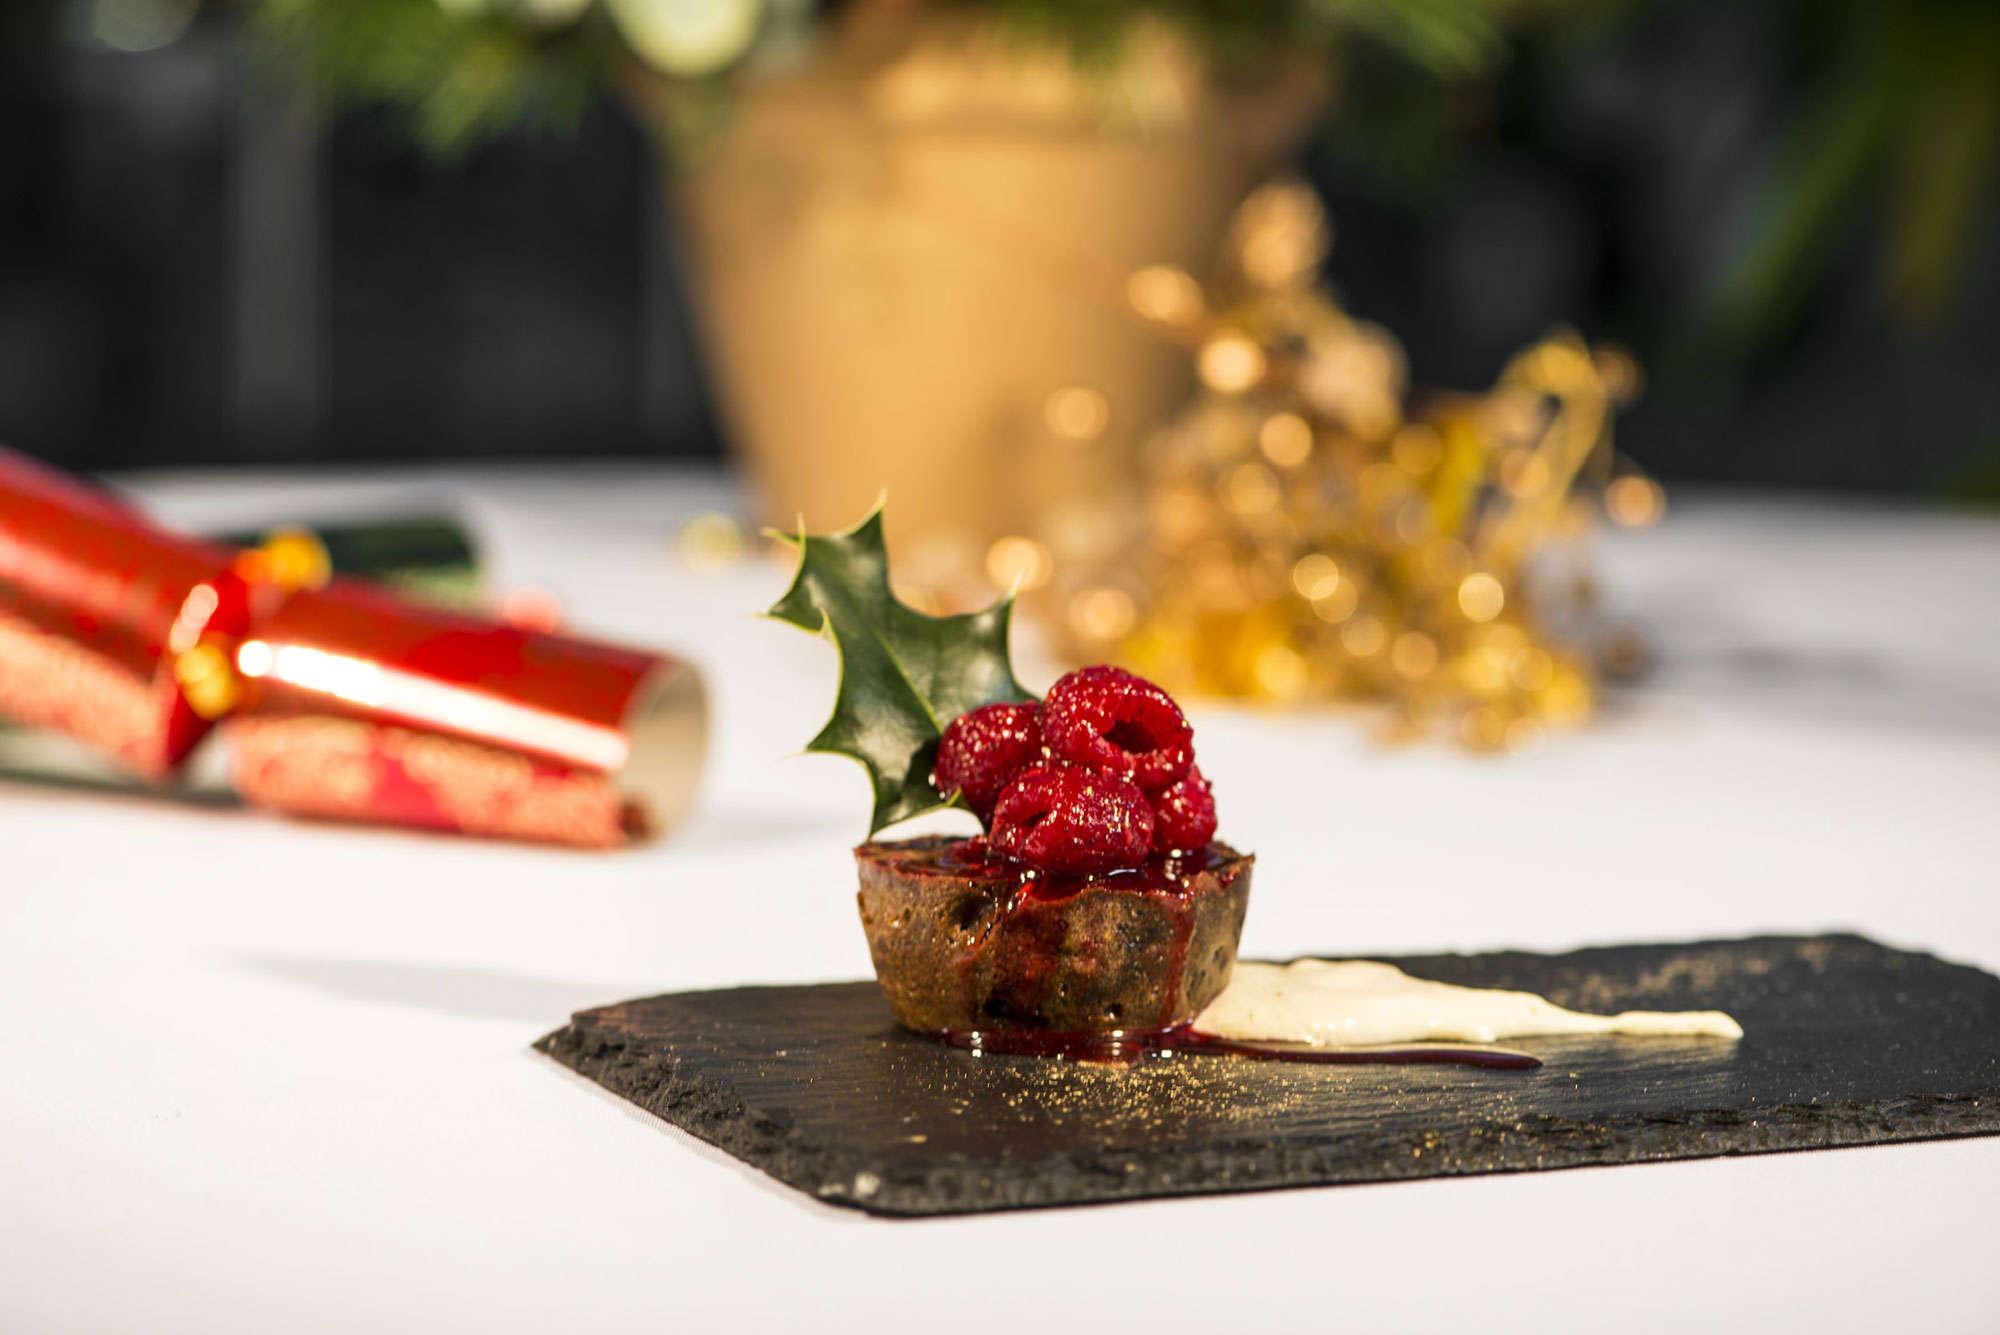 Christmas Menu 2018 - Warm Mini Mince Pie